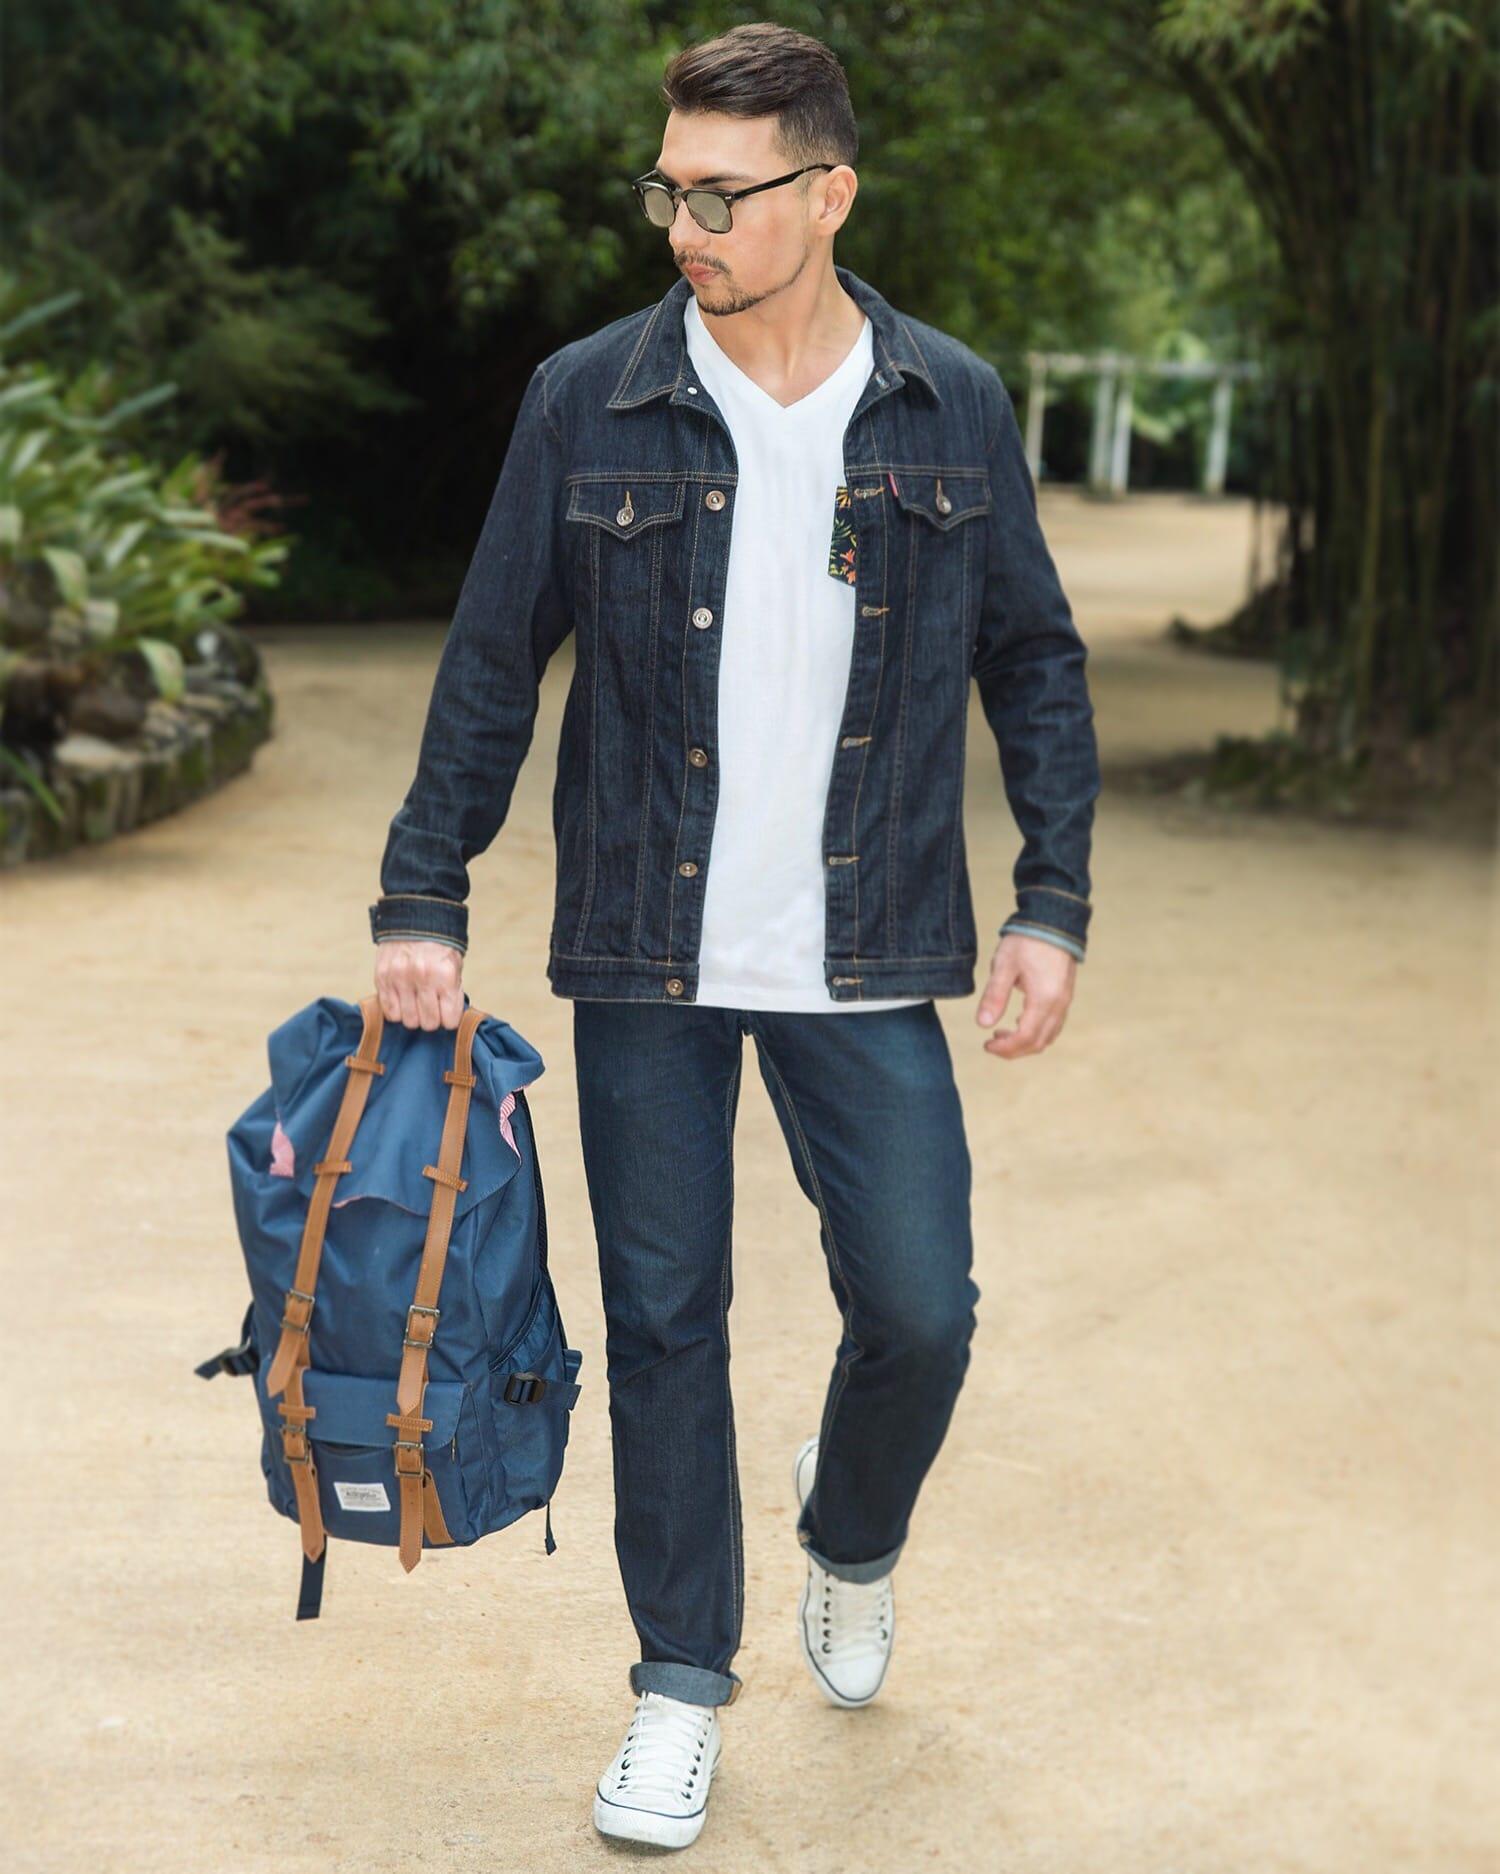 8 Juan alves Estilo HQSC jaqueta jeans e bolso estampado